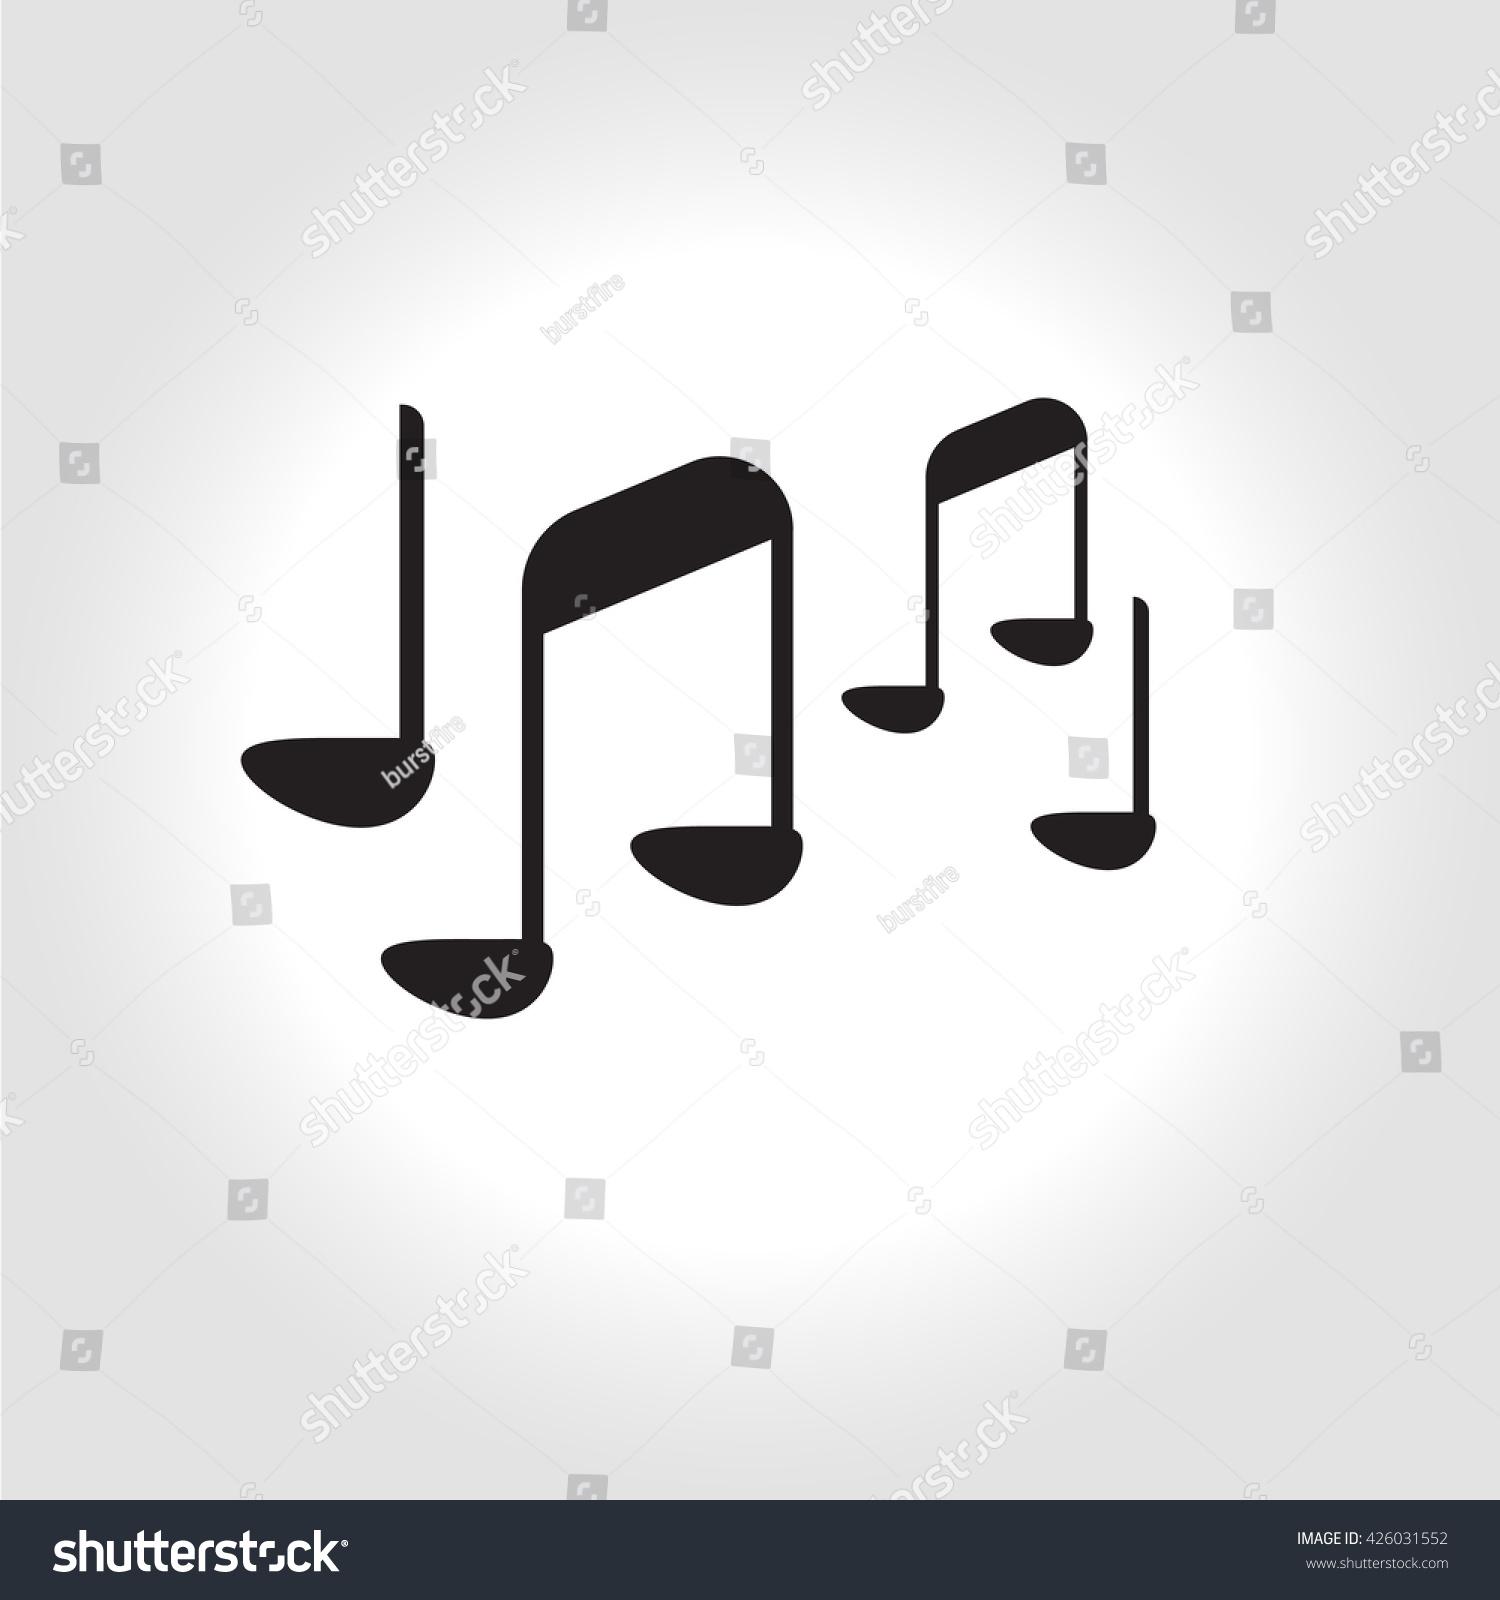 Music note symbol music sign flat stock illustration 426031552 music note symbol music sign flat icon pictogramm buycottarizona